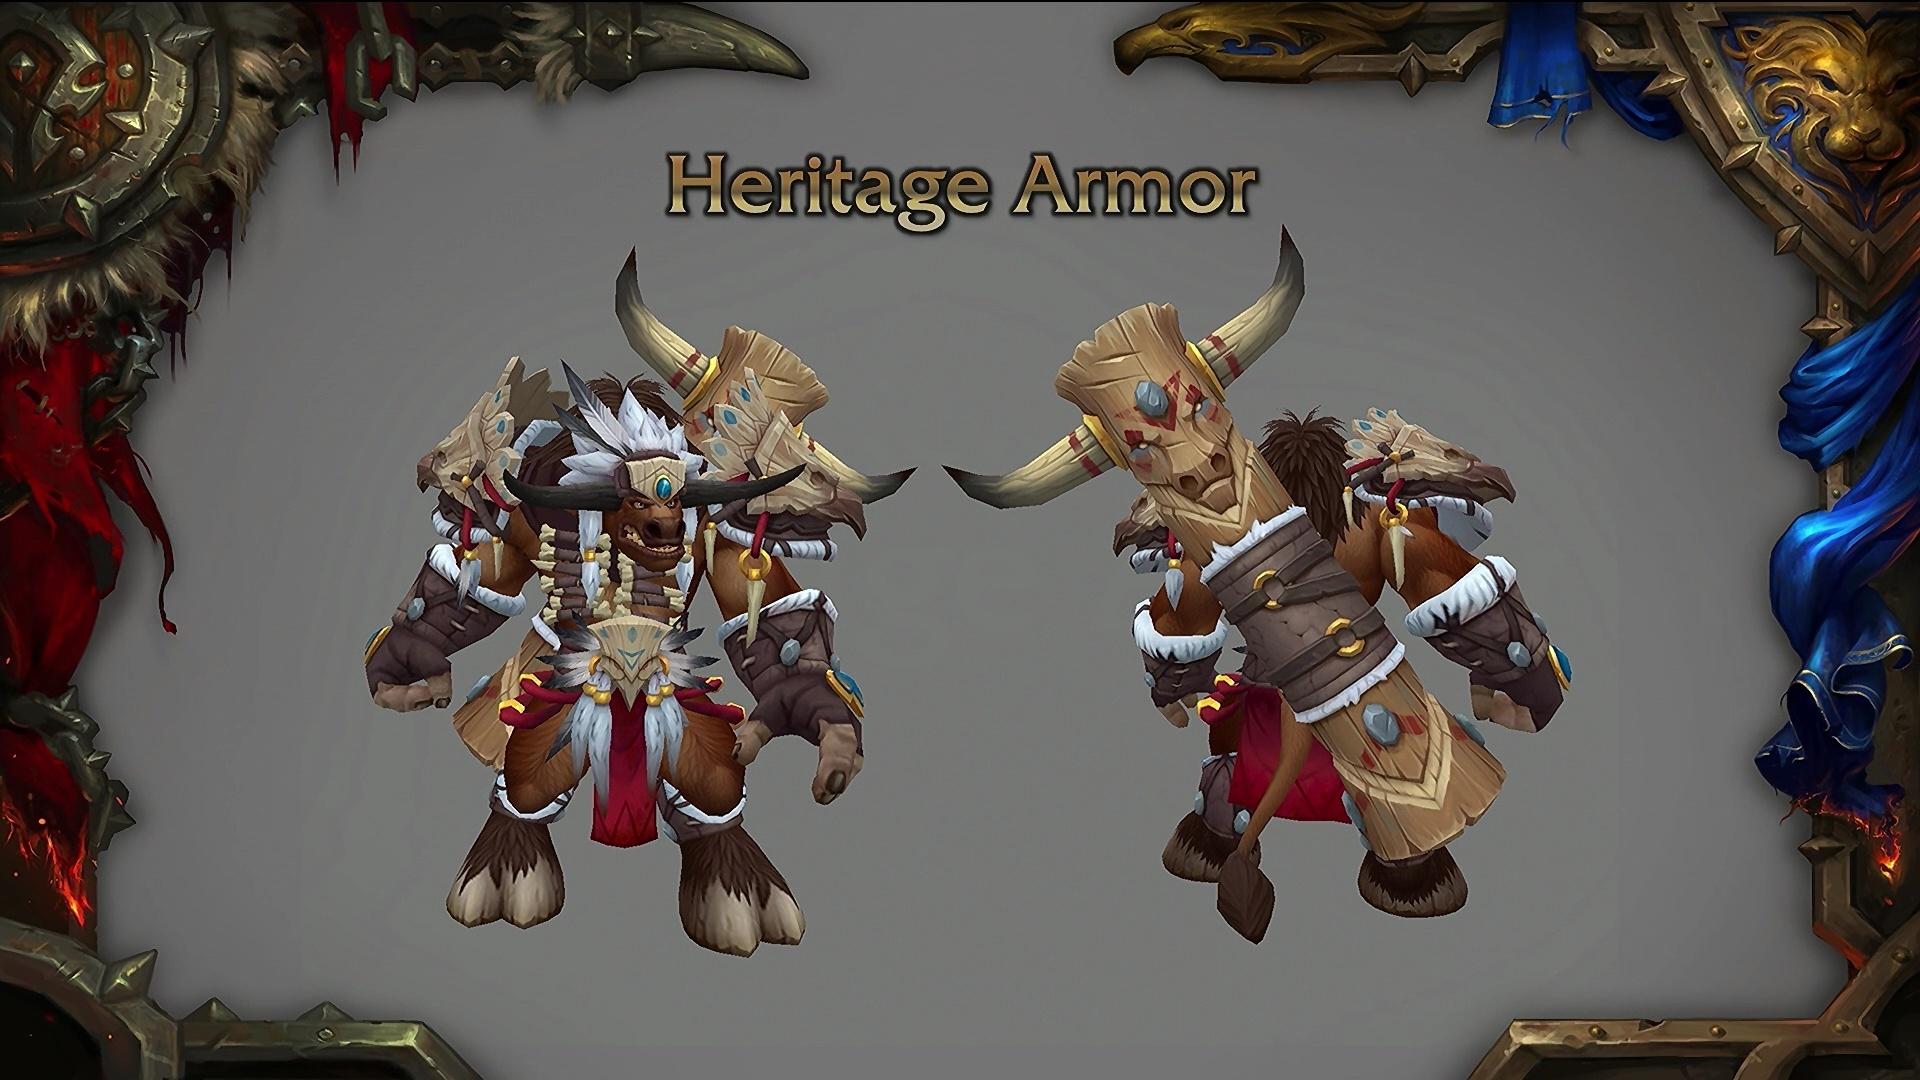 Heritage Armor